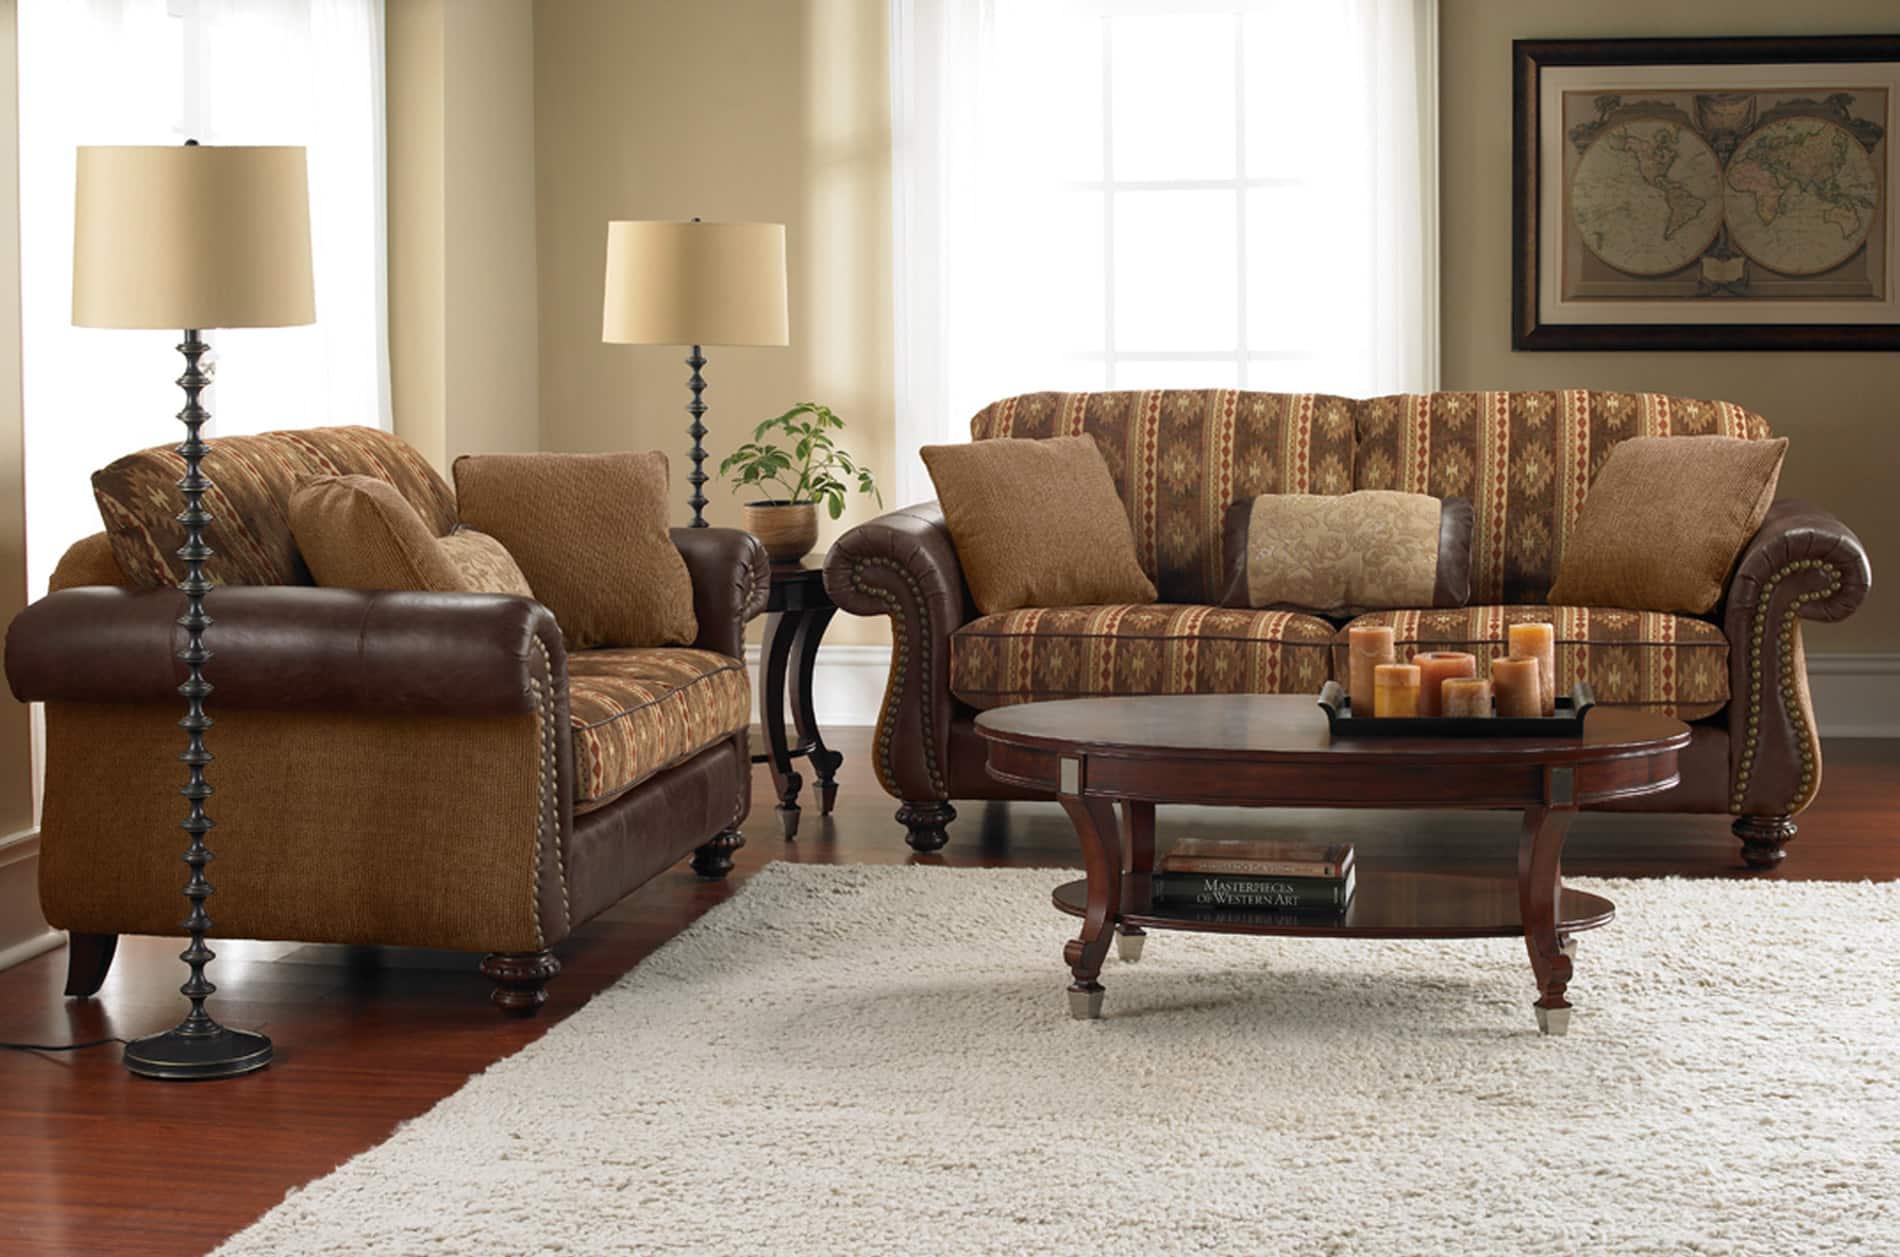 Livingston Leather Fabric Sofa And